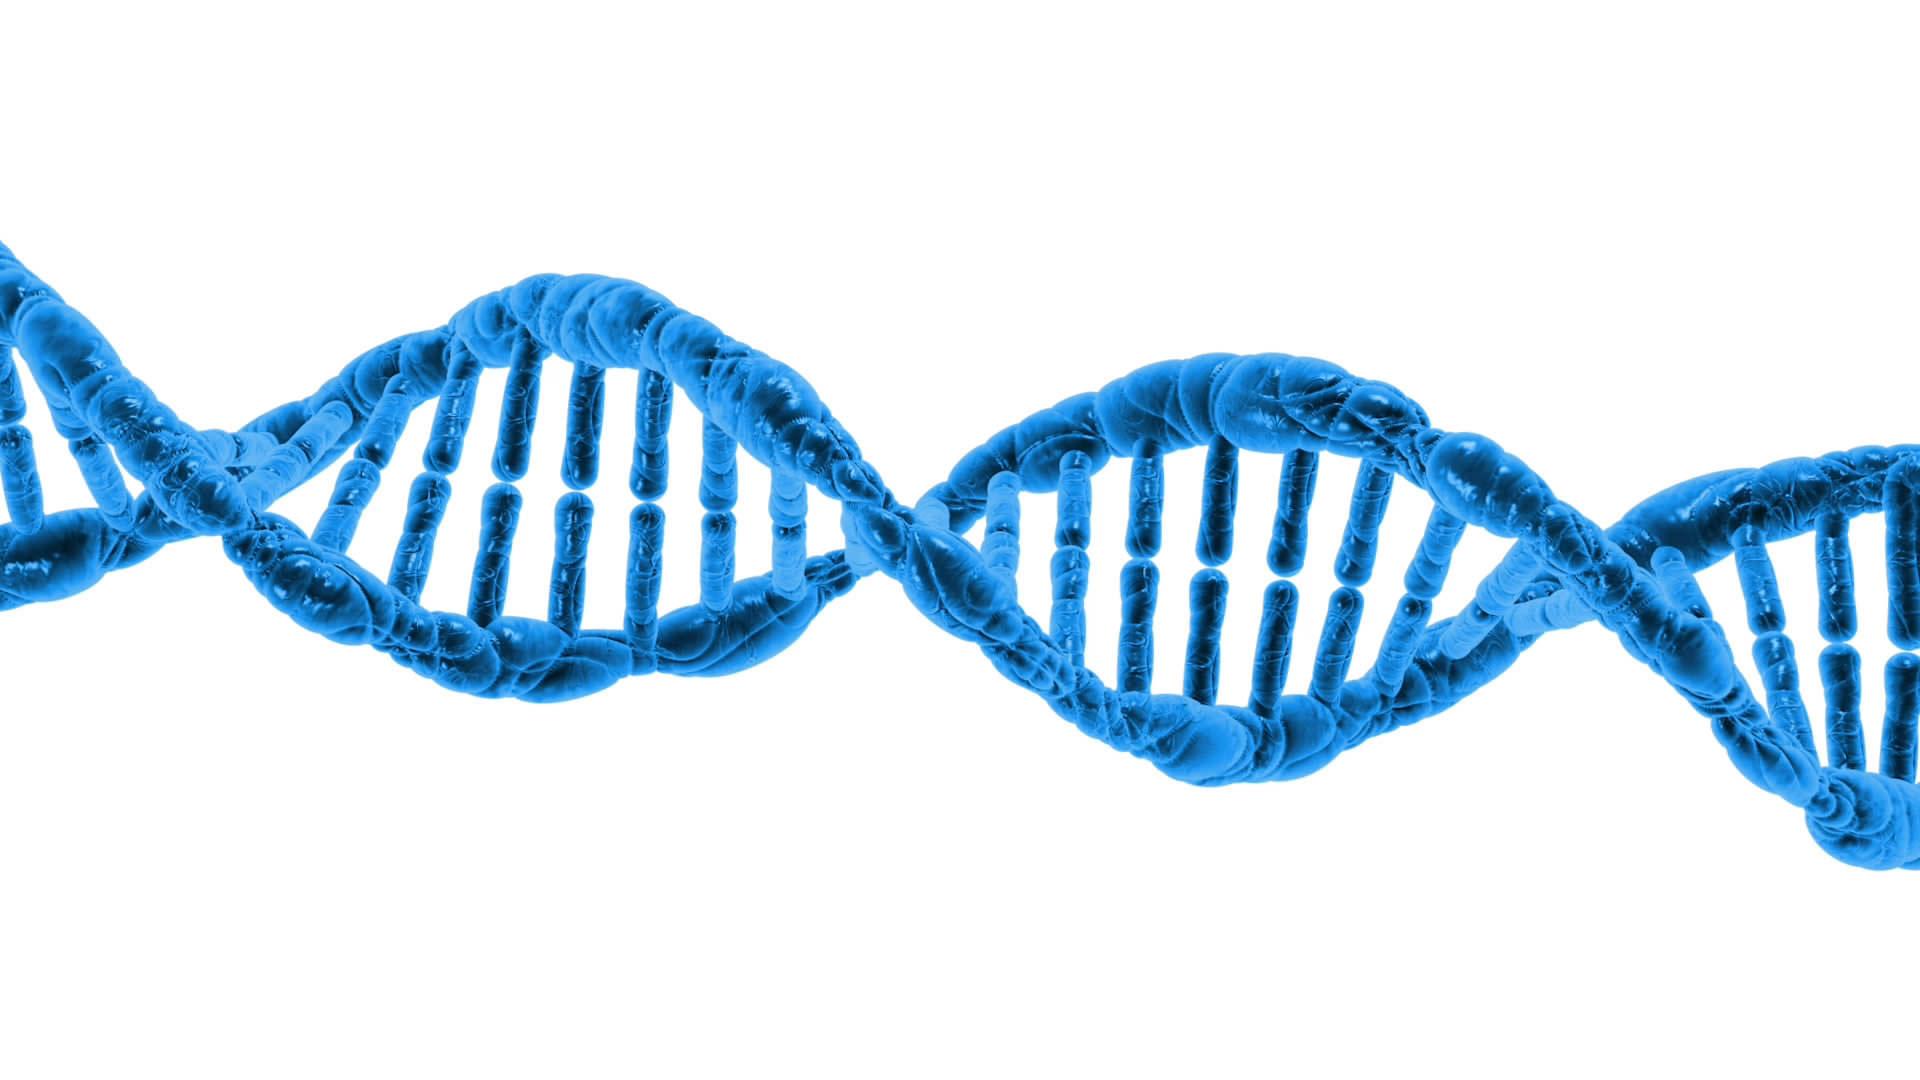 Human - Genetics - thumbnail